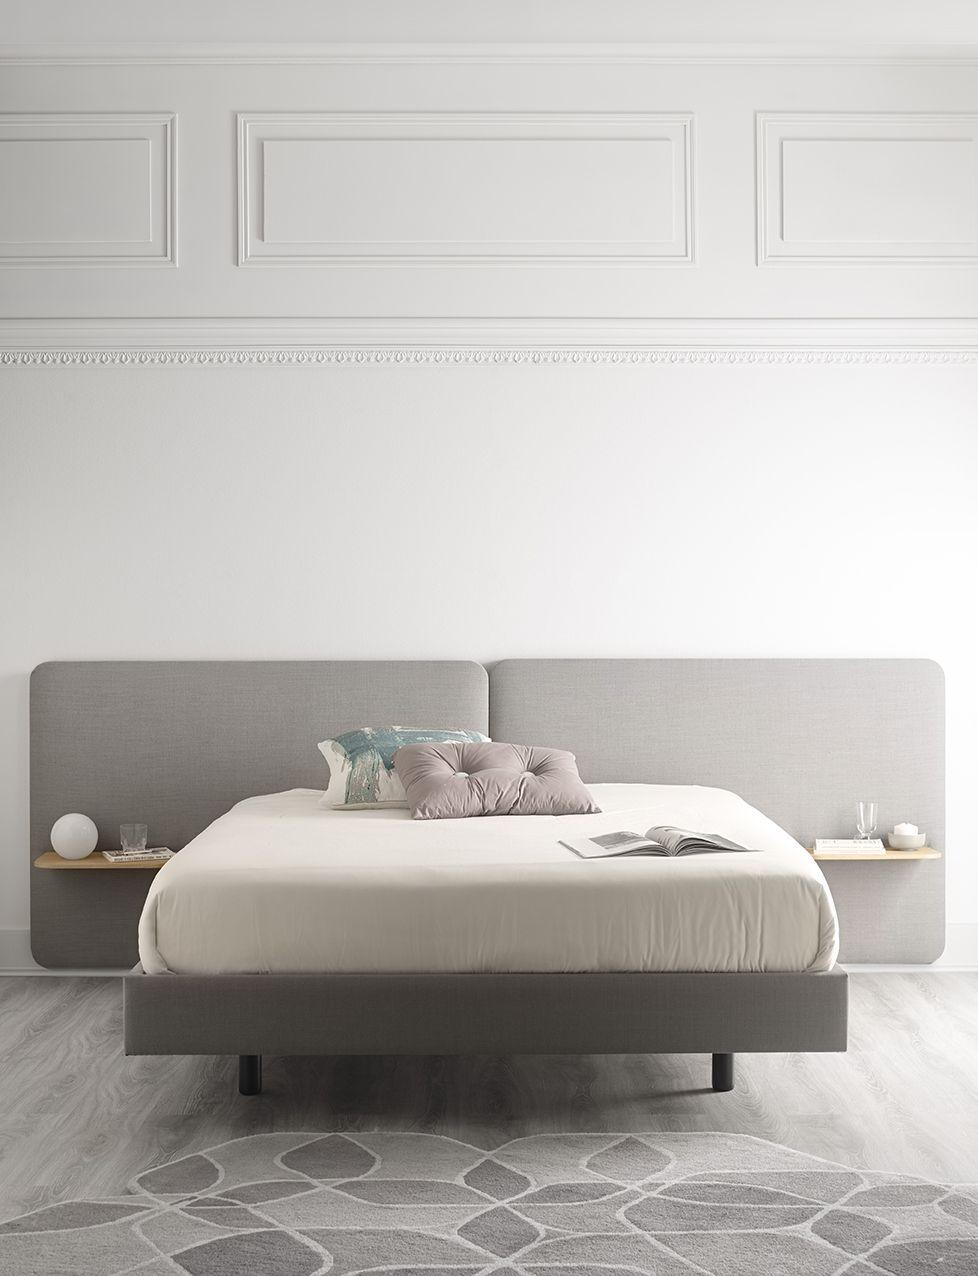 Lota Bed Bedroom Ibon Arrizabalaga Treku Furniture | 卧室 | Bed